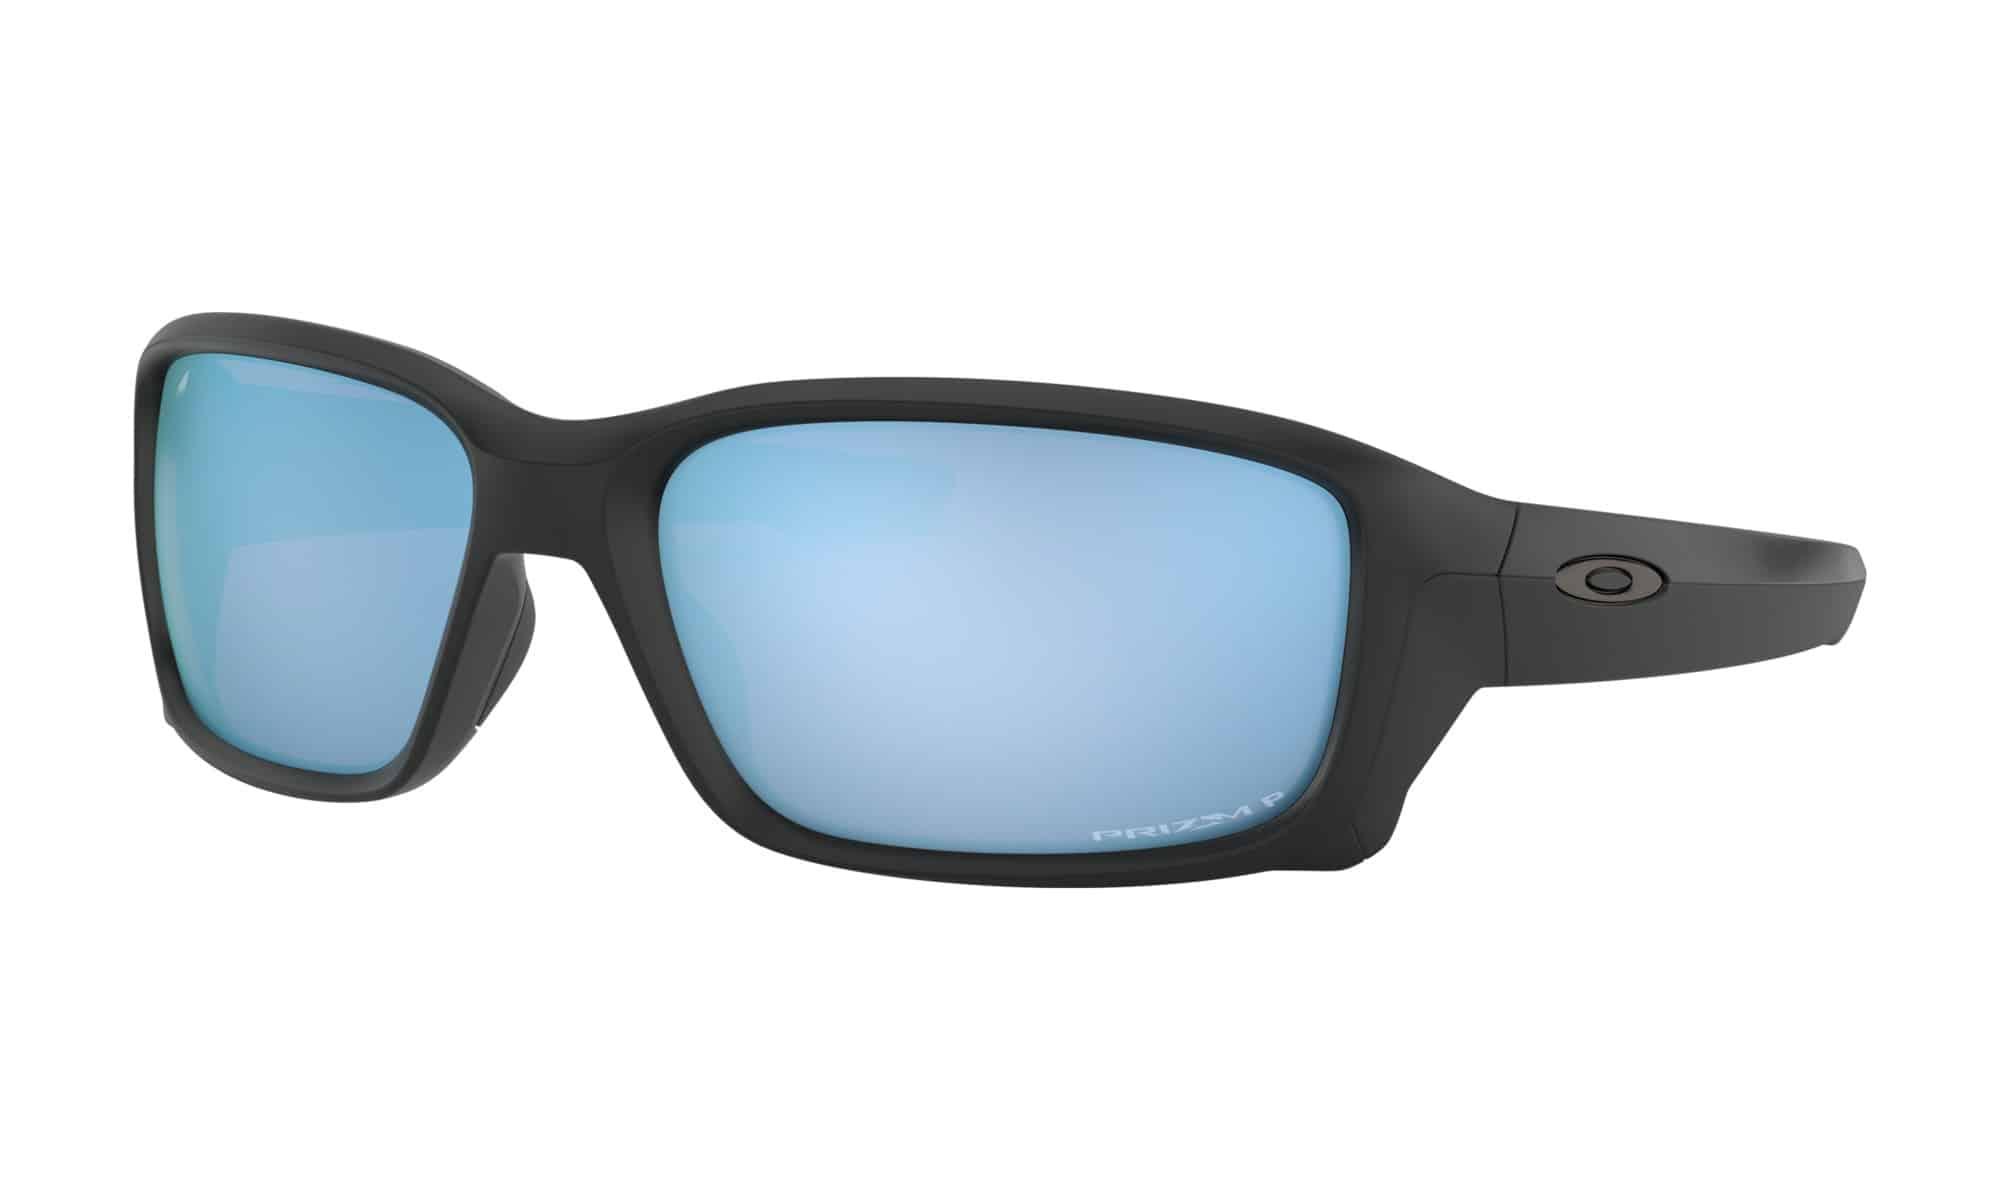 Oakley StraightLink Sunglasses OO9331-05-1